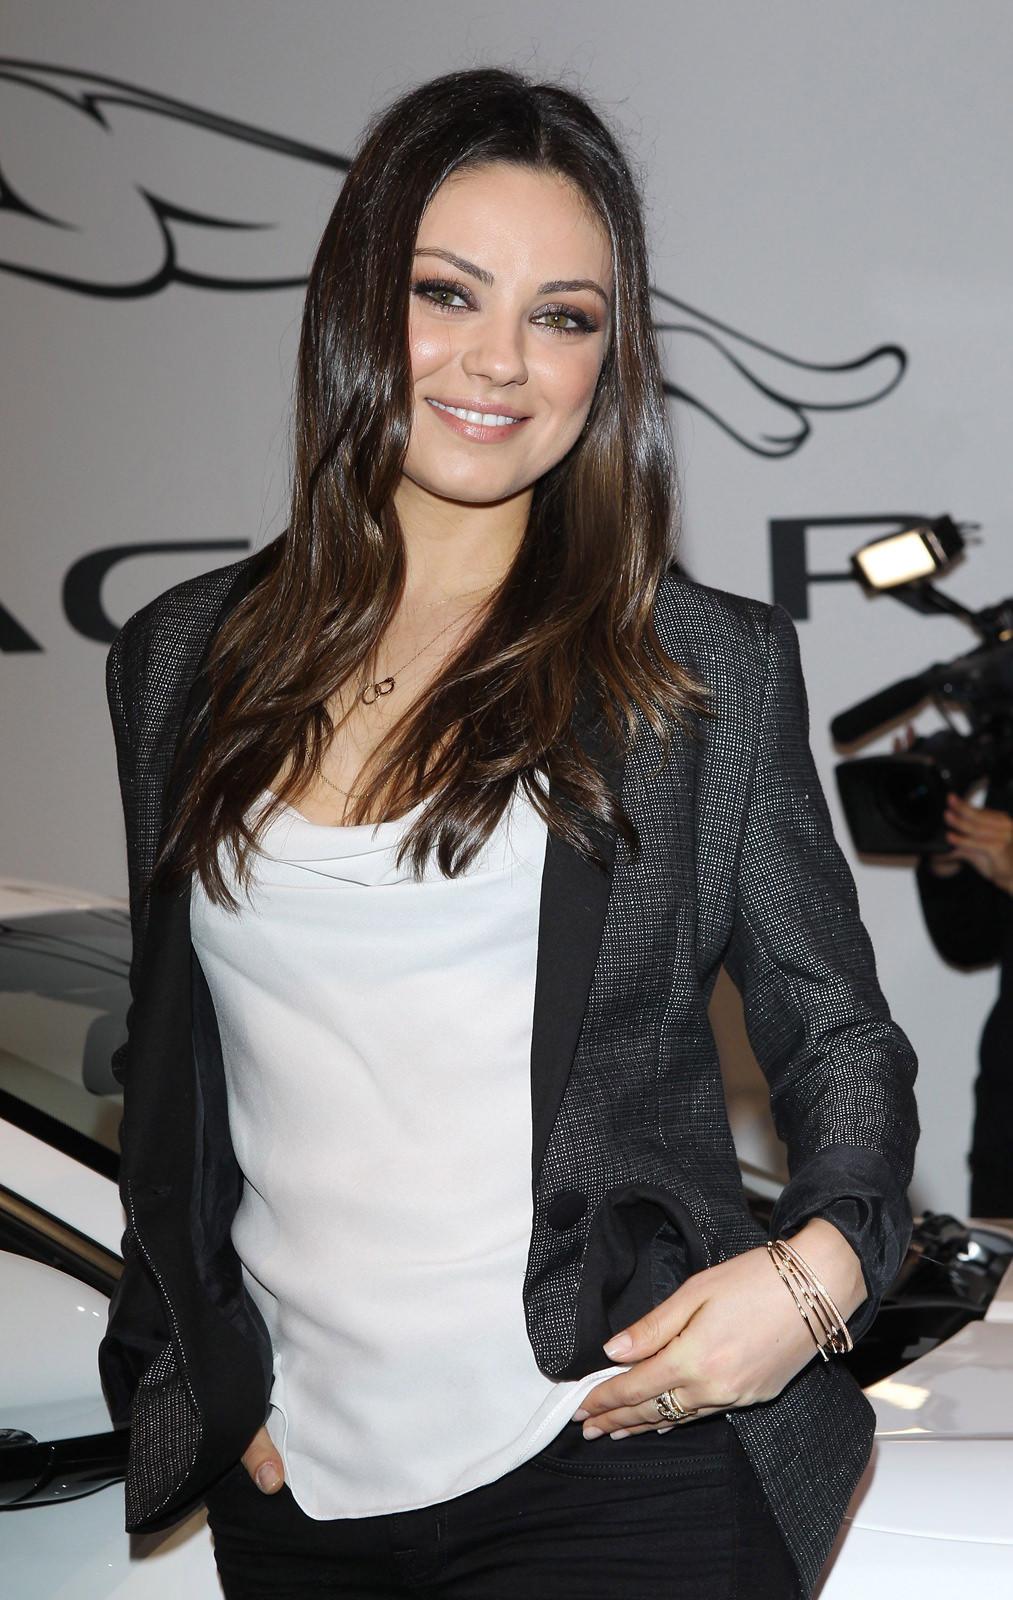 Mila Kunis Photo Gallery